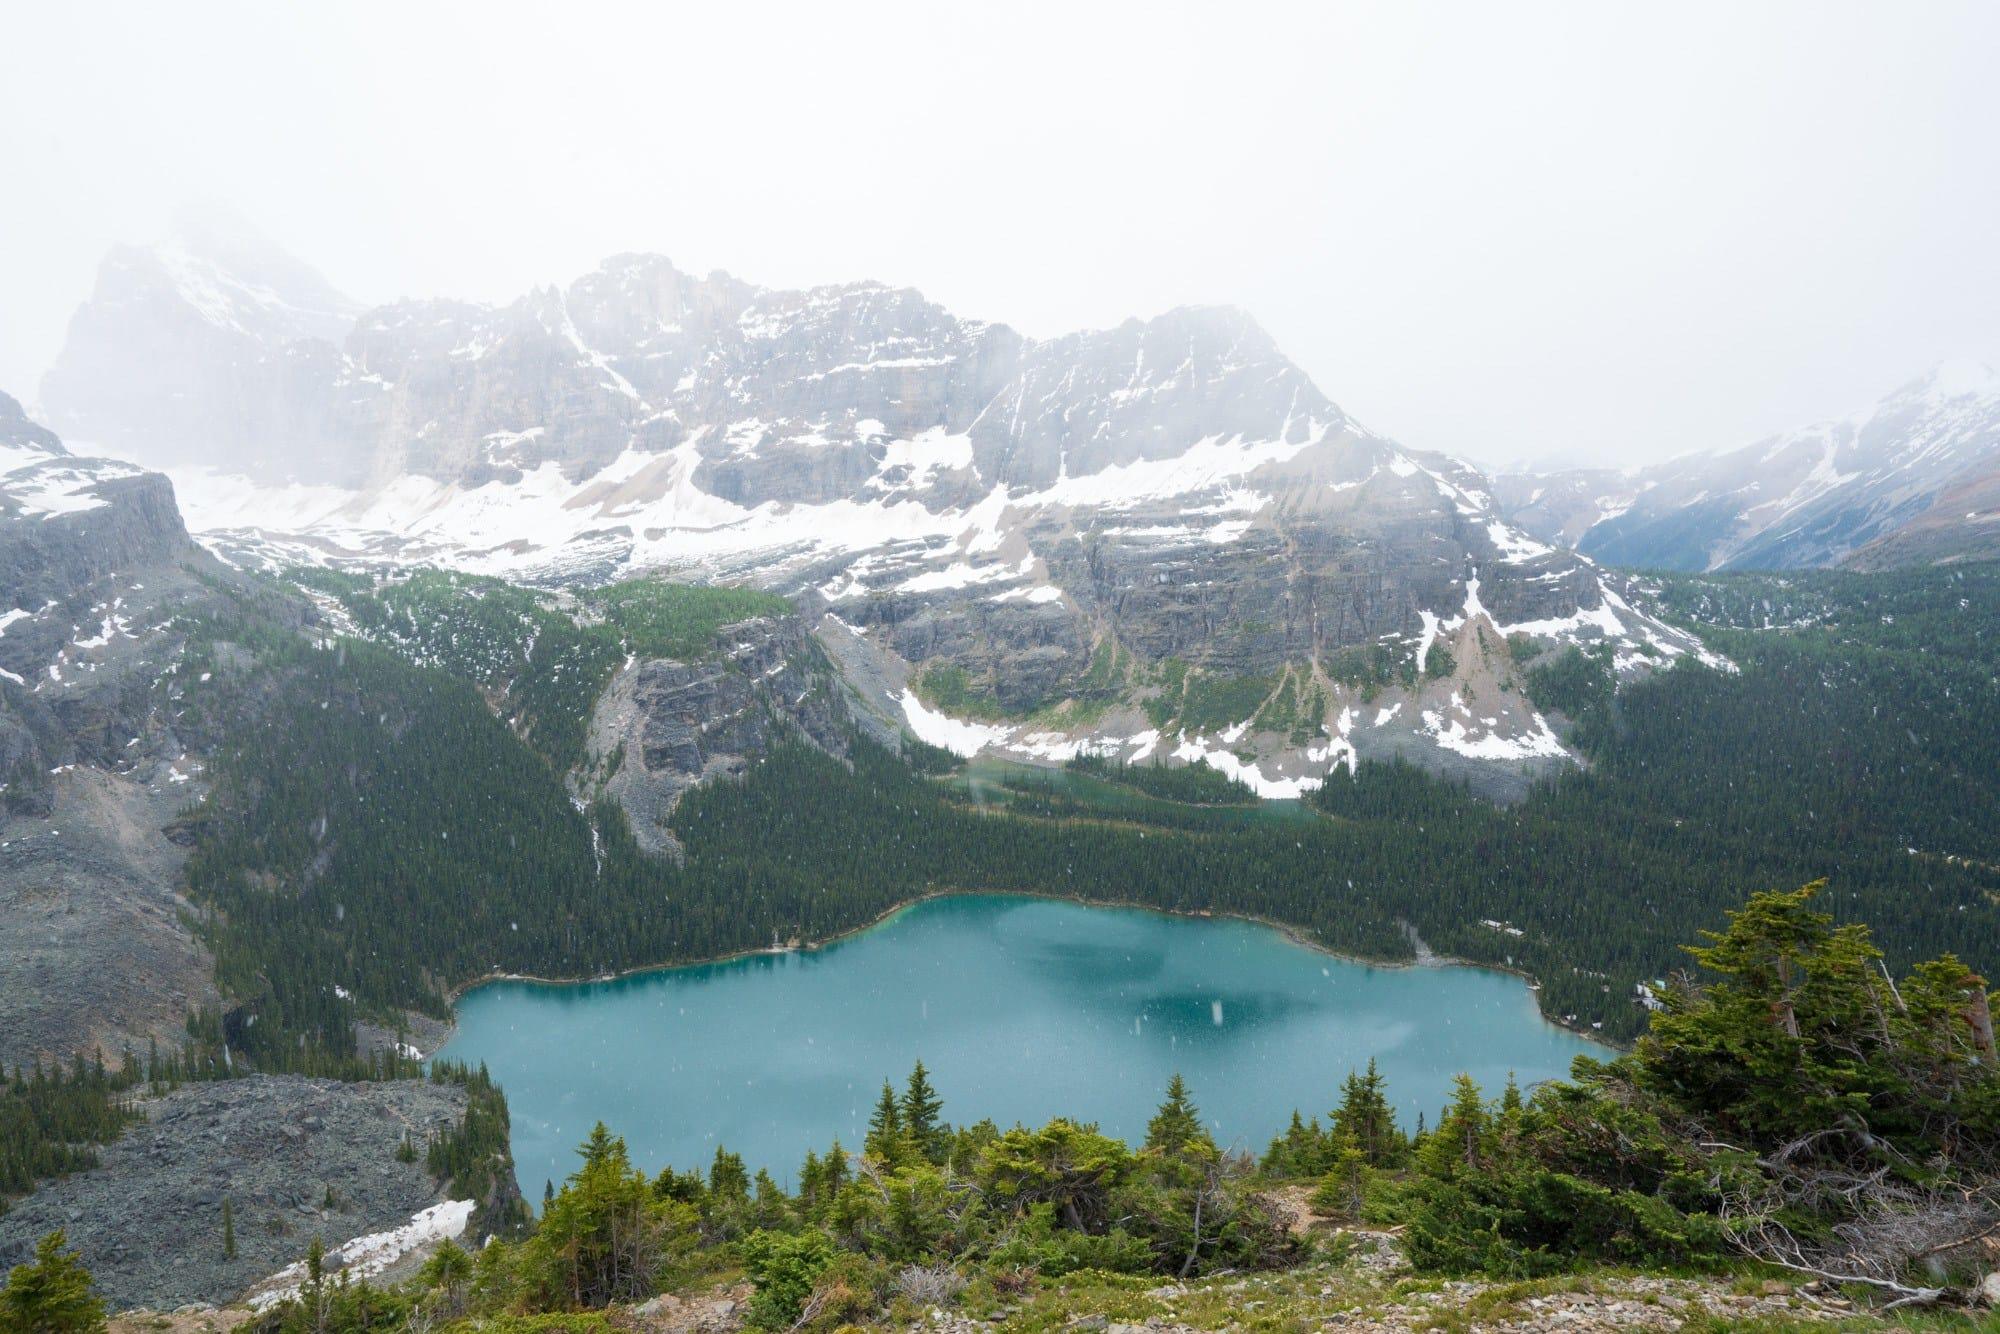 Lake O'Hara Hiking Trails in Yoho National Park